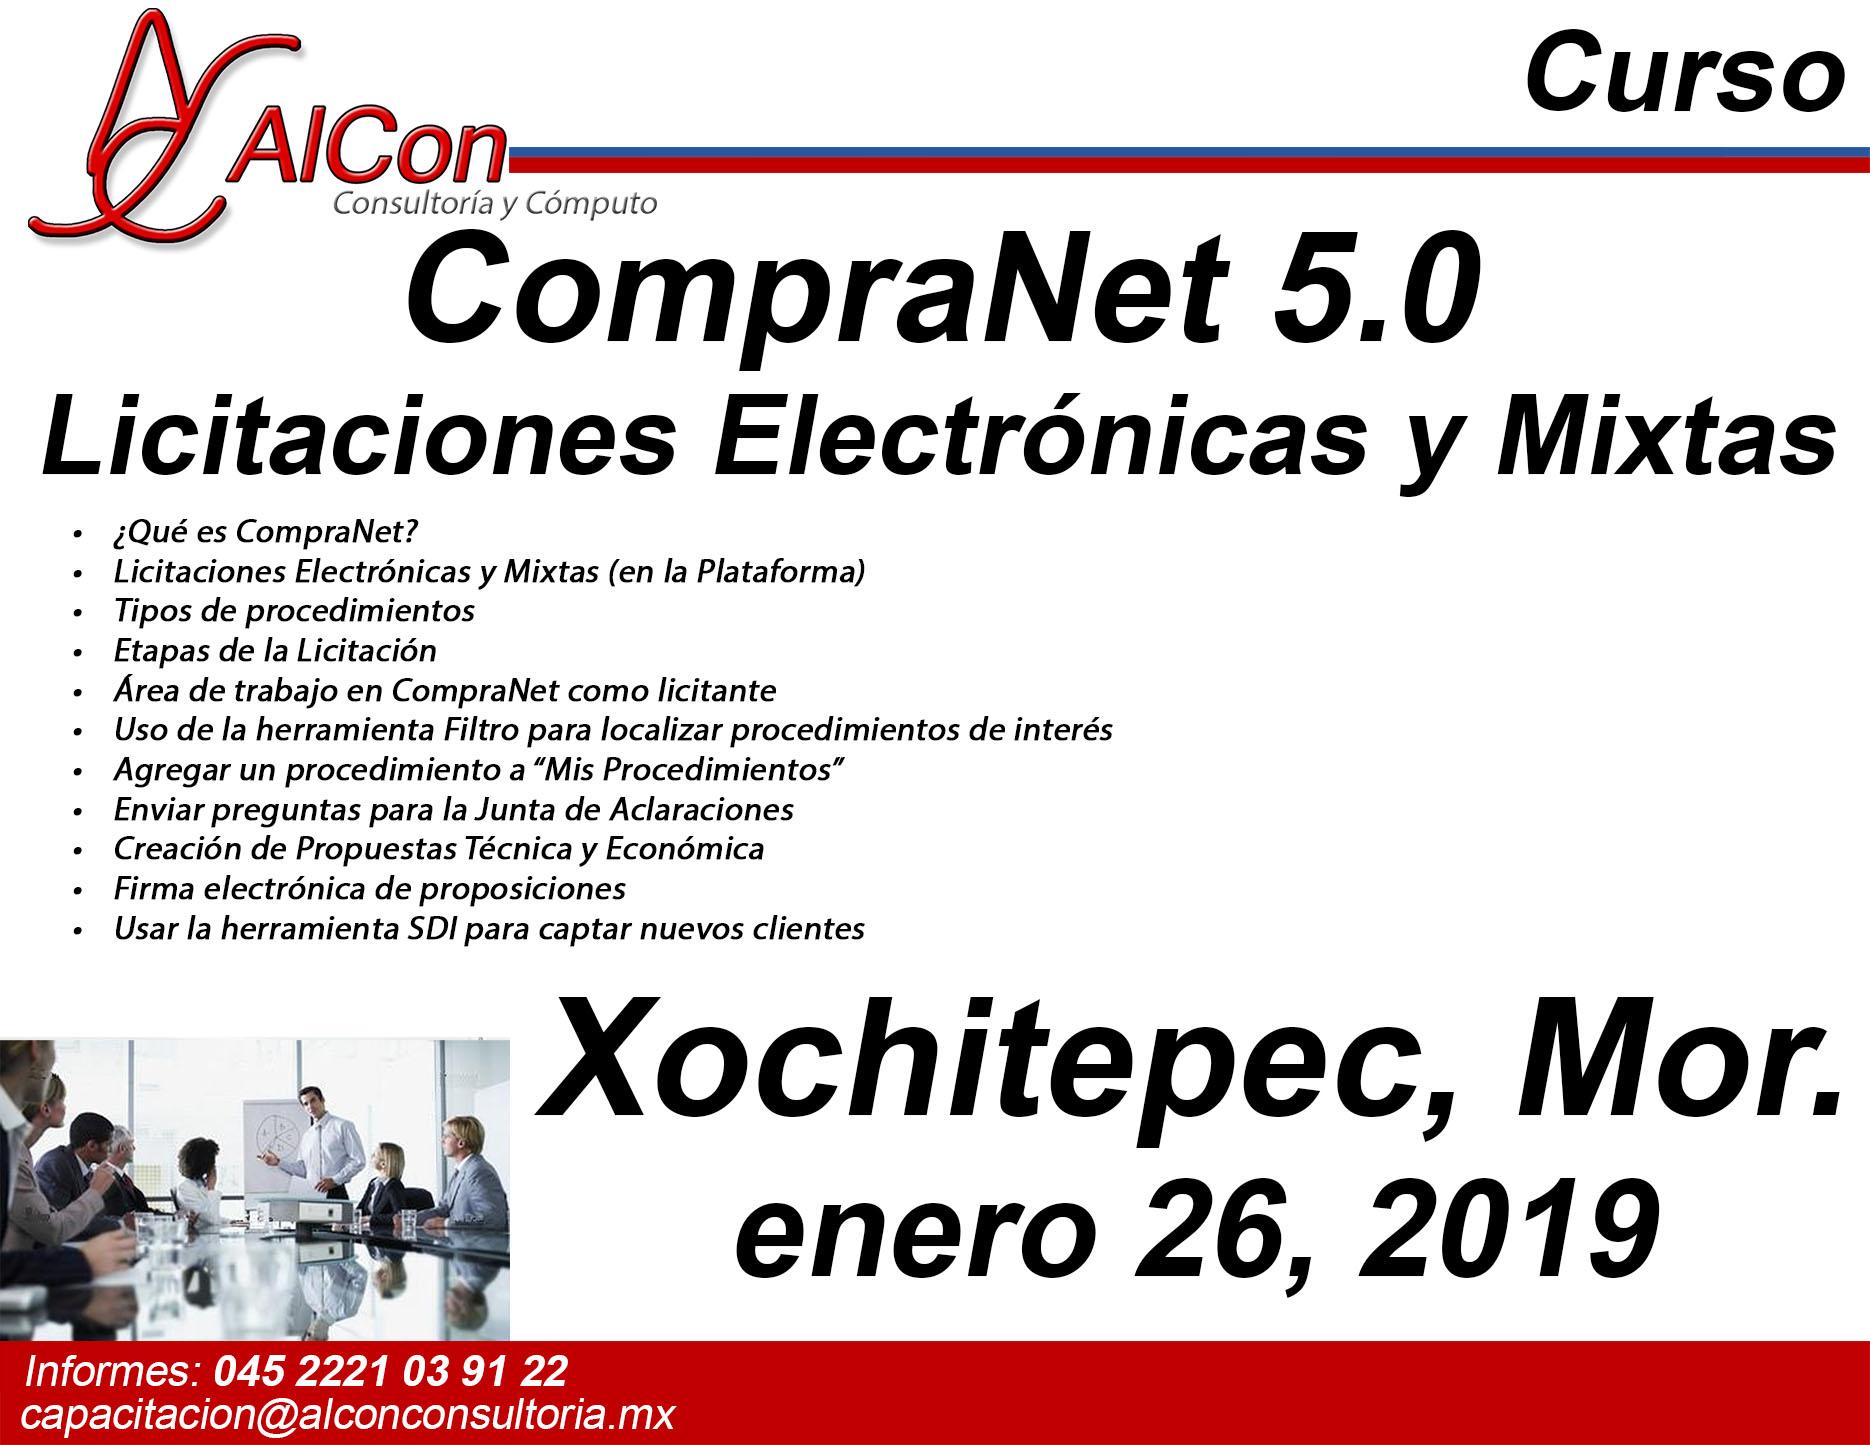 Curso CompraNet 5.0 Xochitepec, Morelos